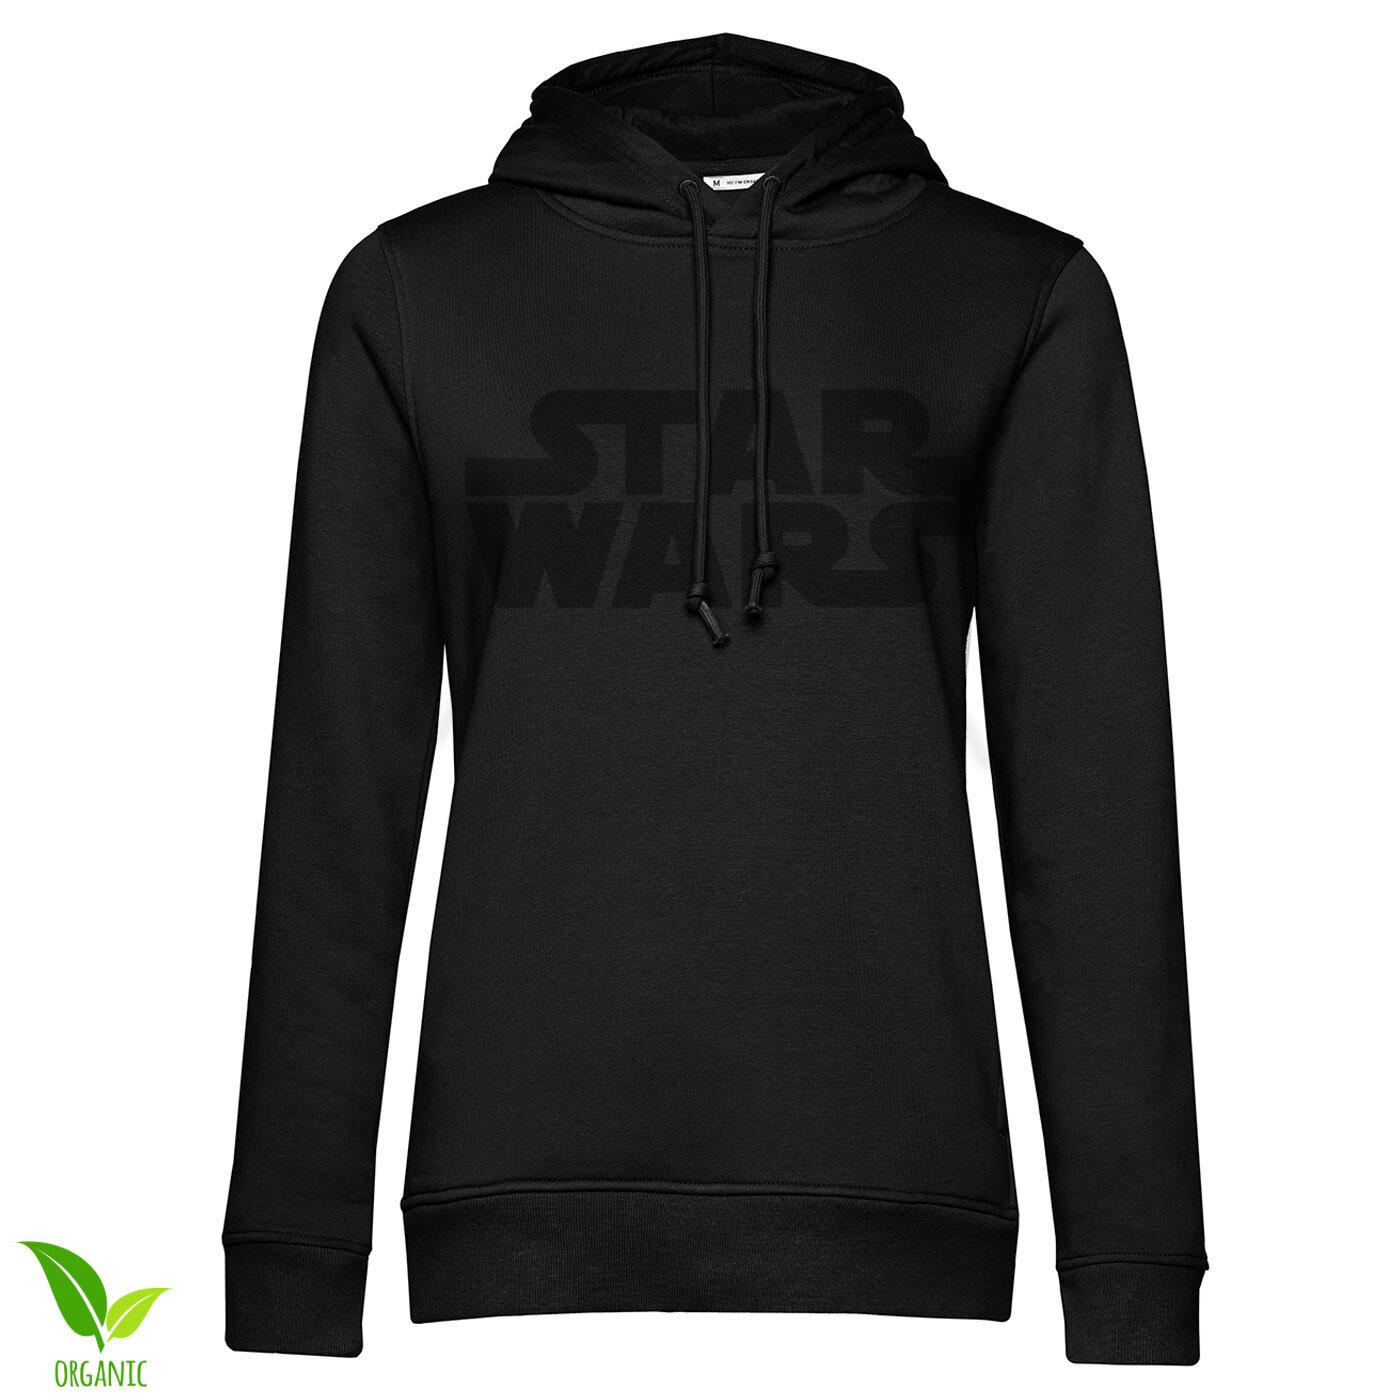 Star Wars Black Logo Girls Hoodie